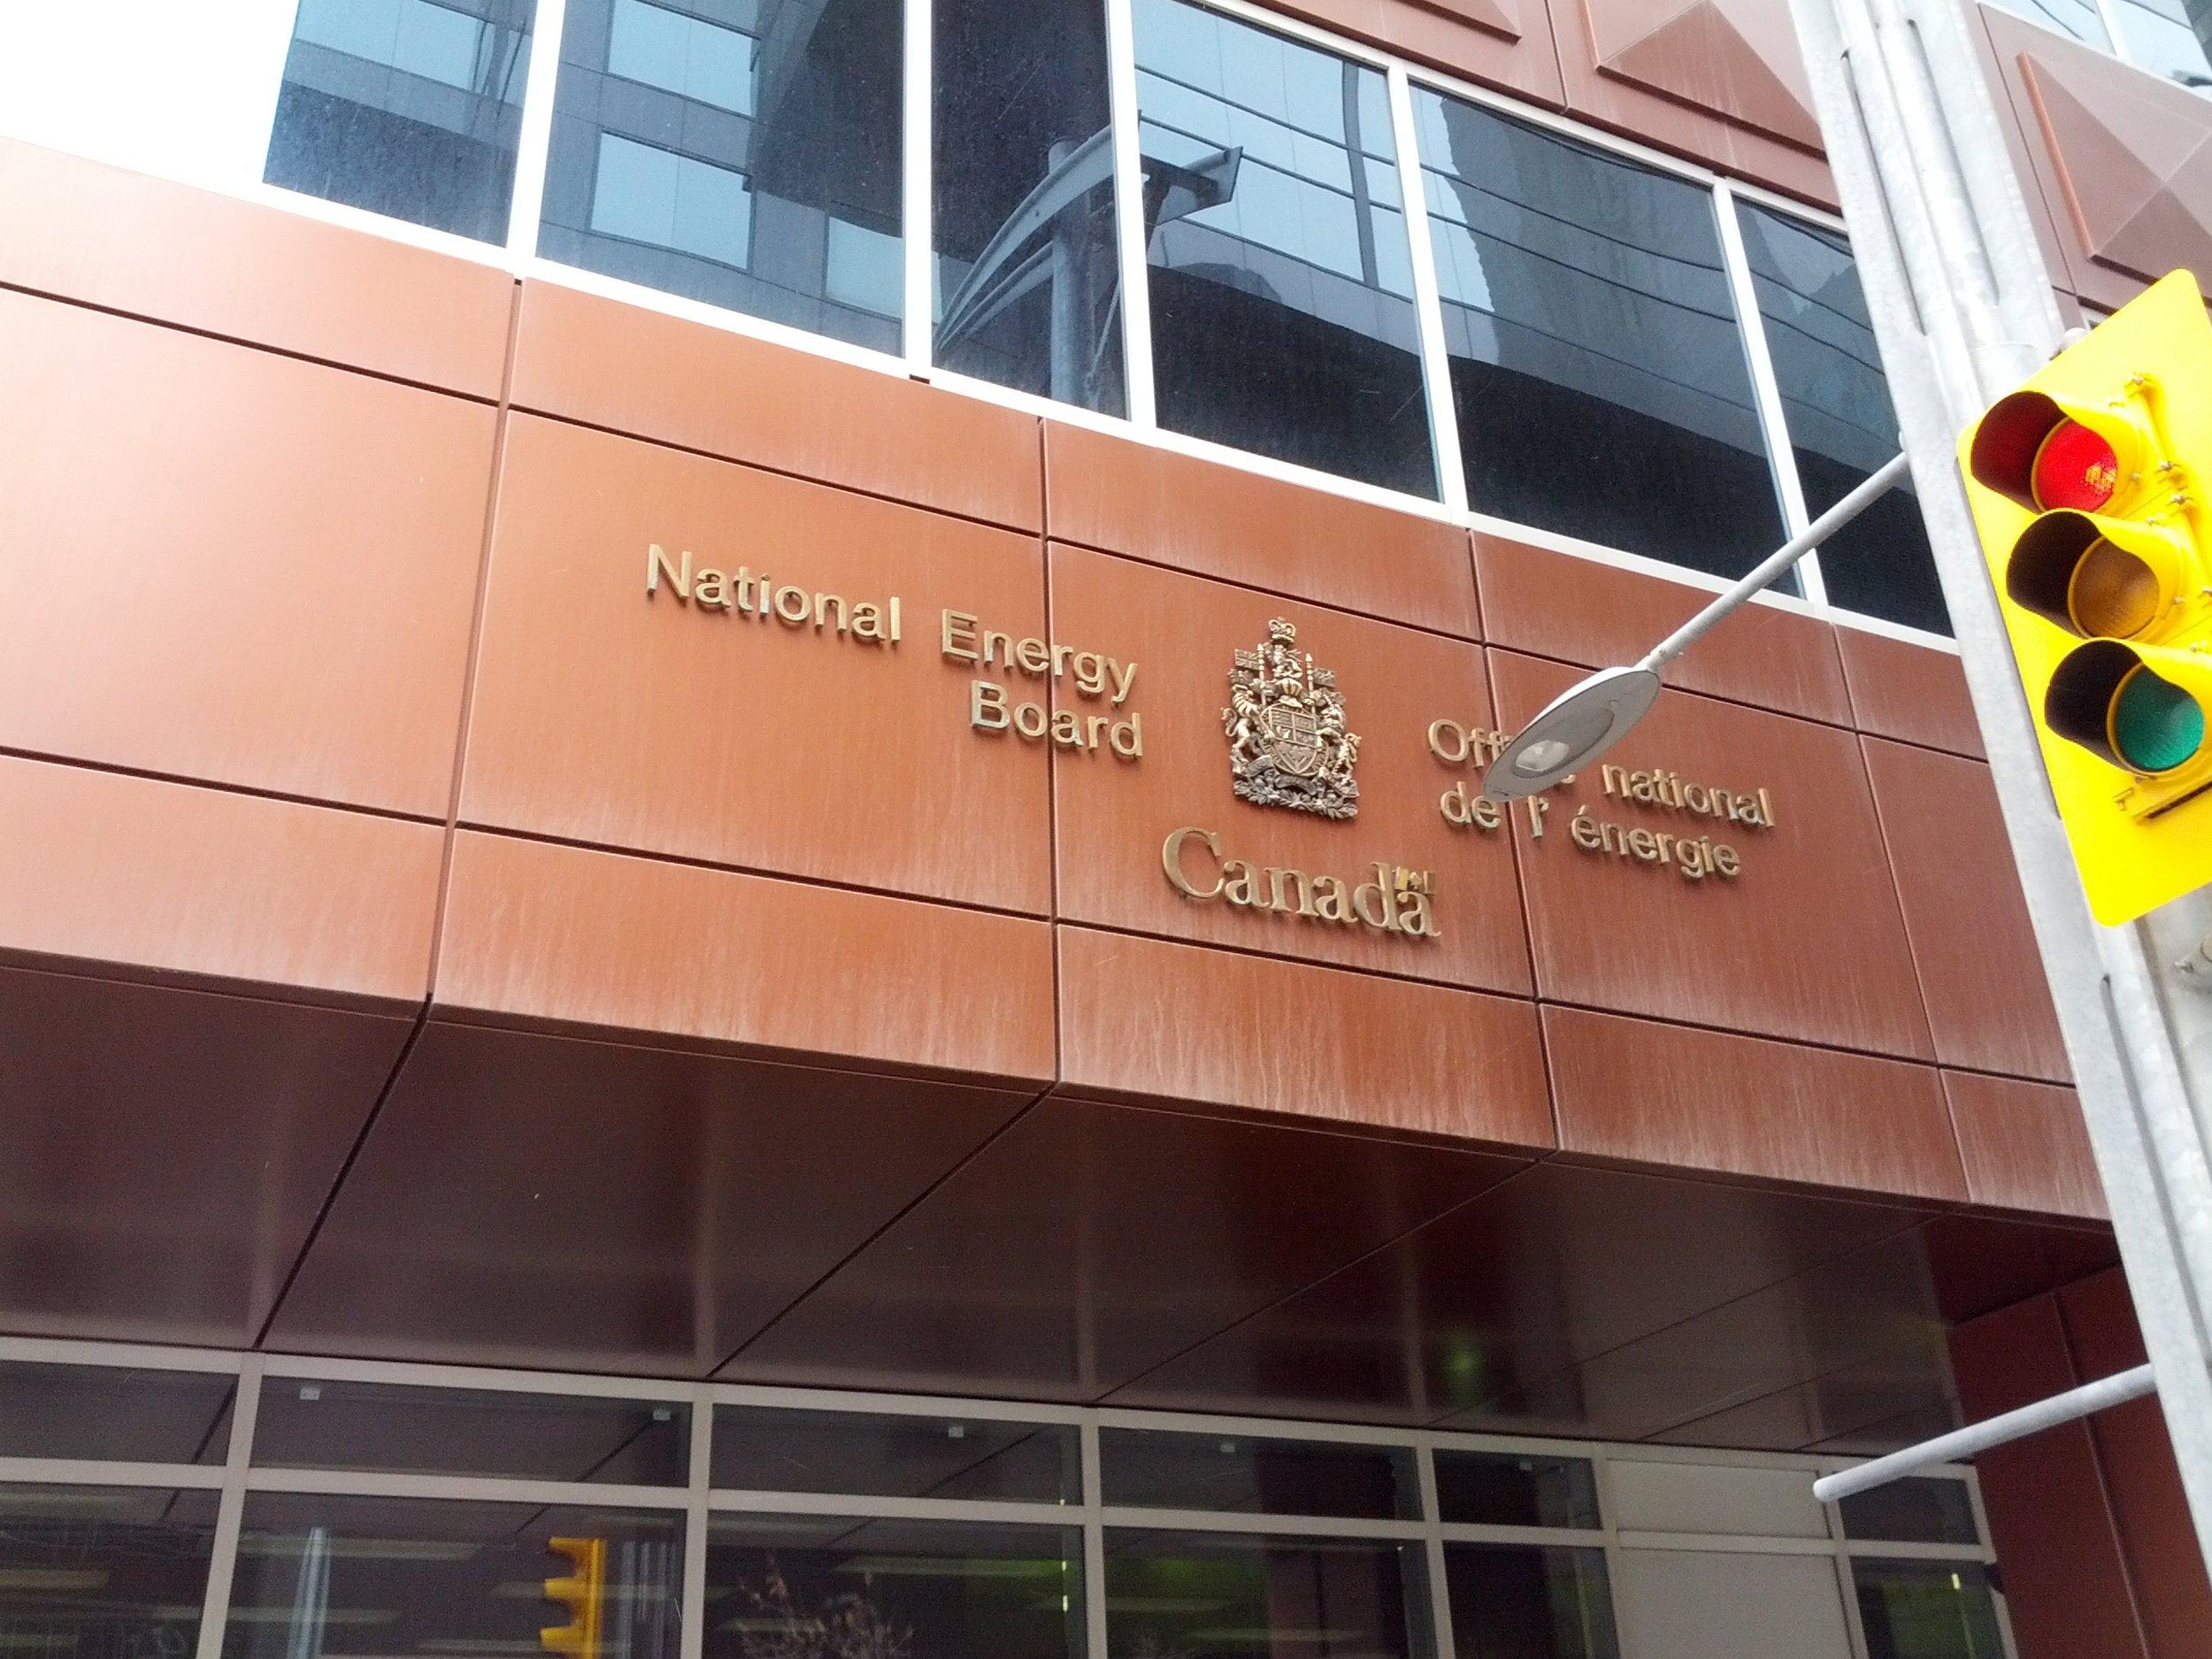 National Energy Board Offices, Calgary, Alberta ( Active History )